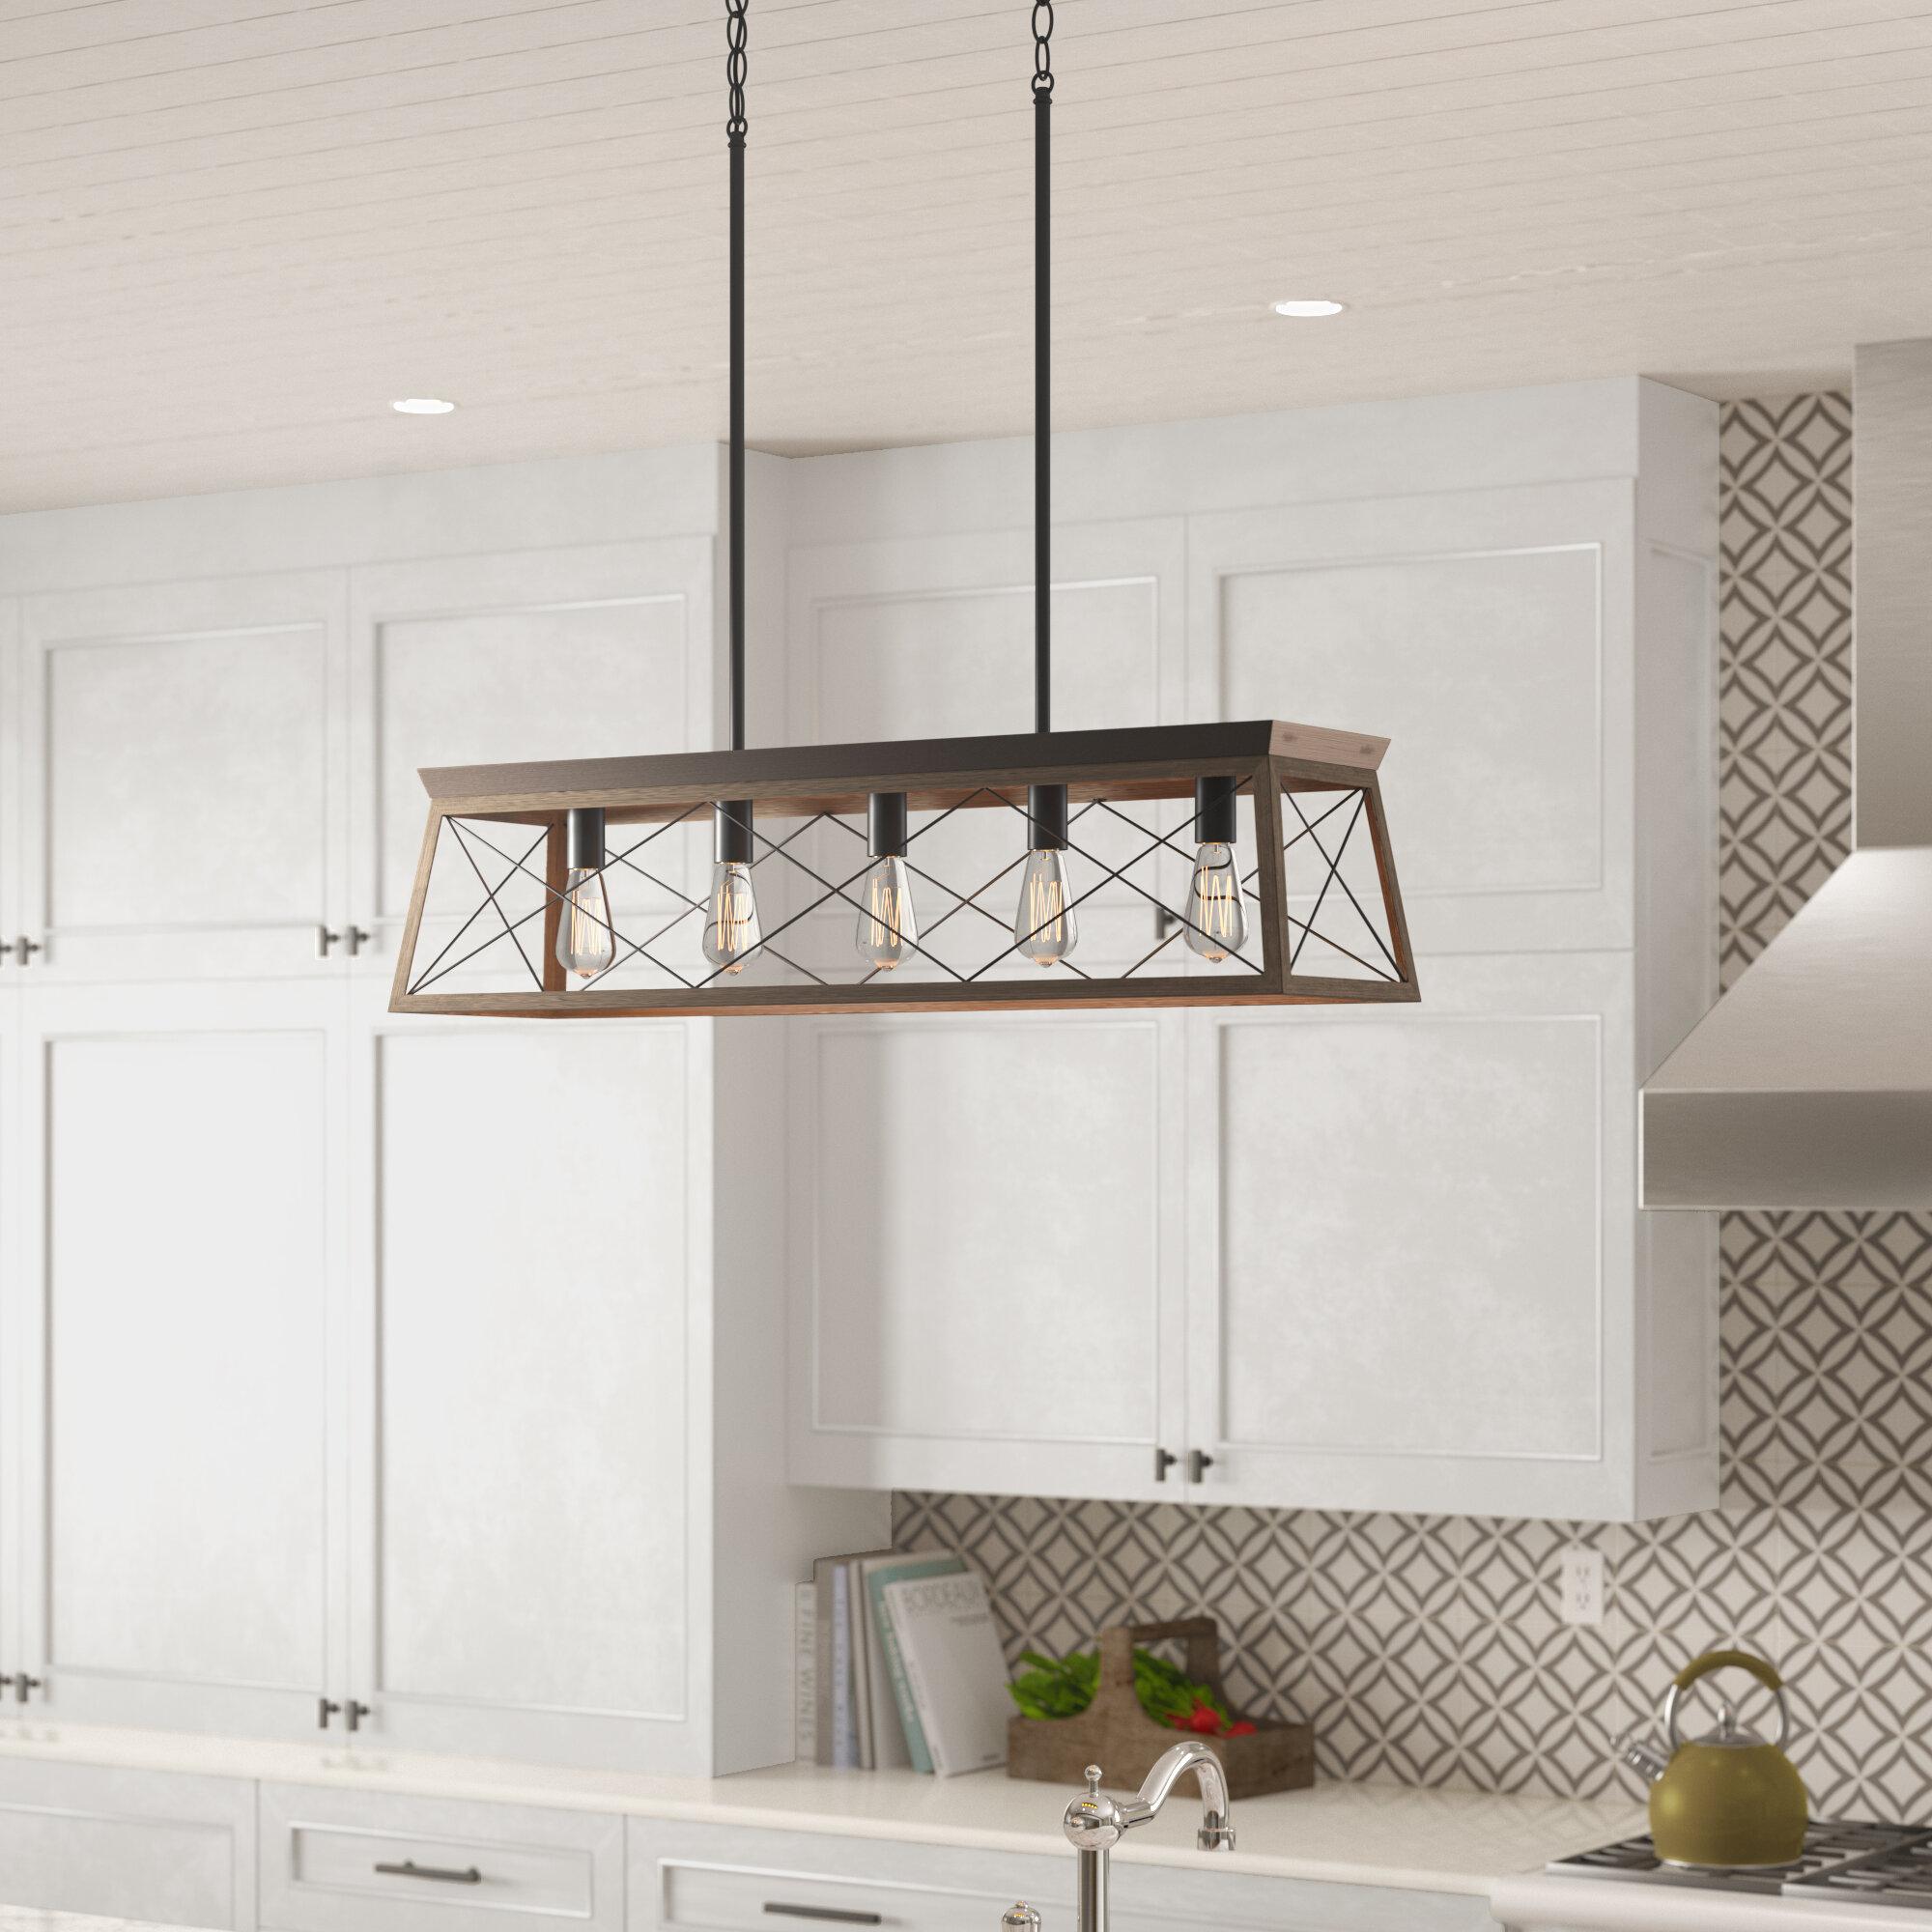 Laurel Foundry Modern Farmhouse Delon 5-Light Kitchen Island Pendant